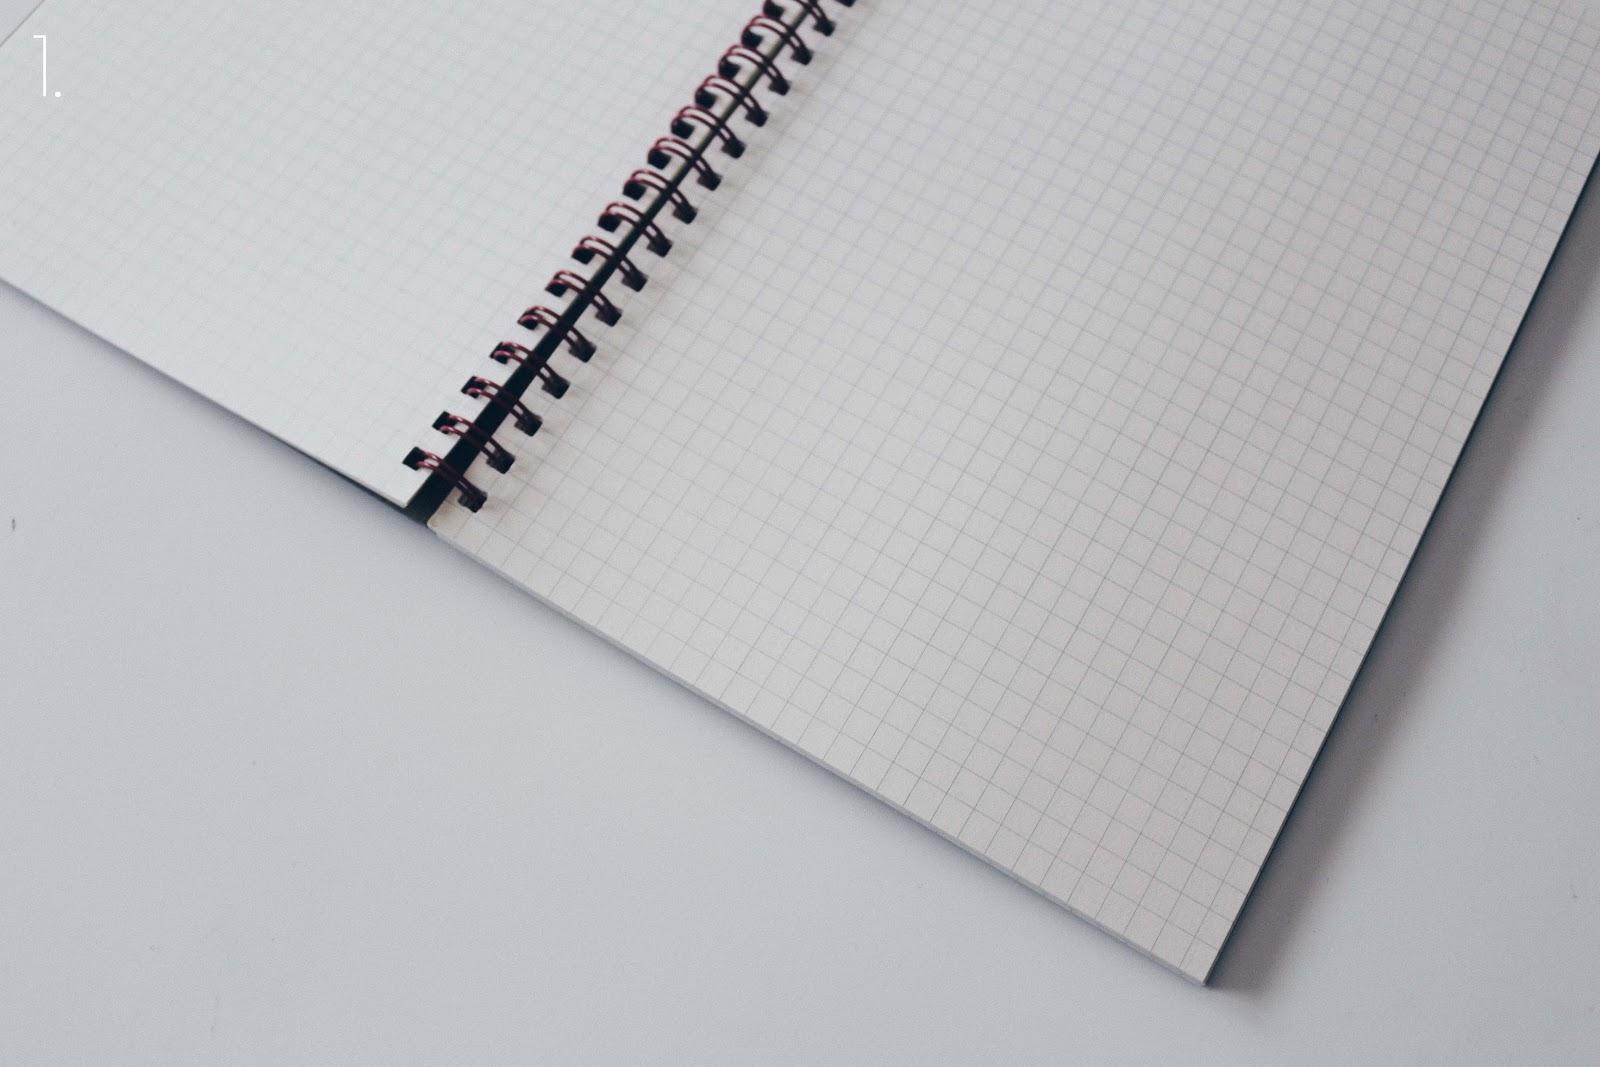 calligraphy art materials